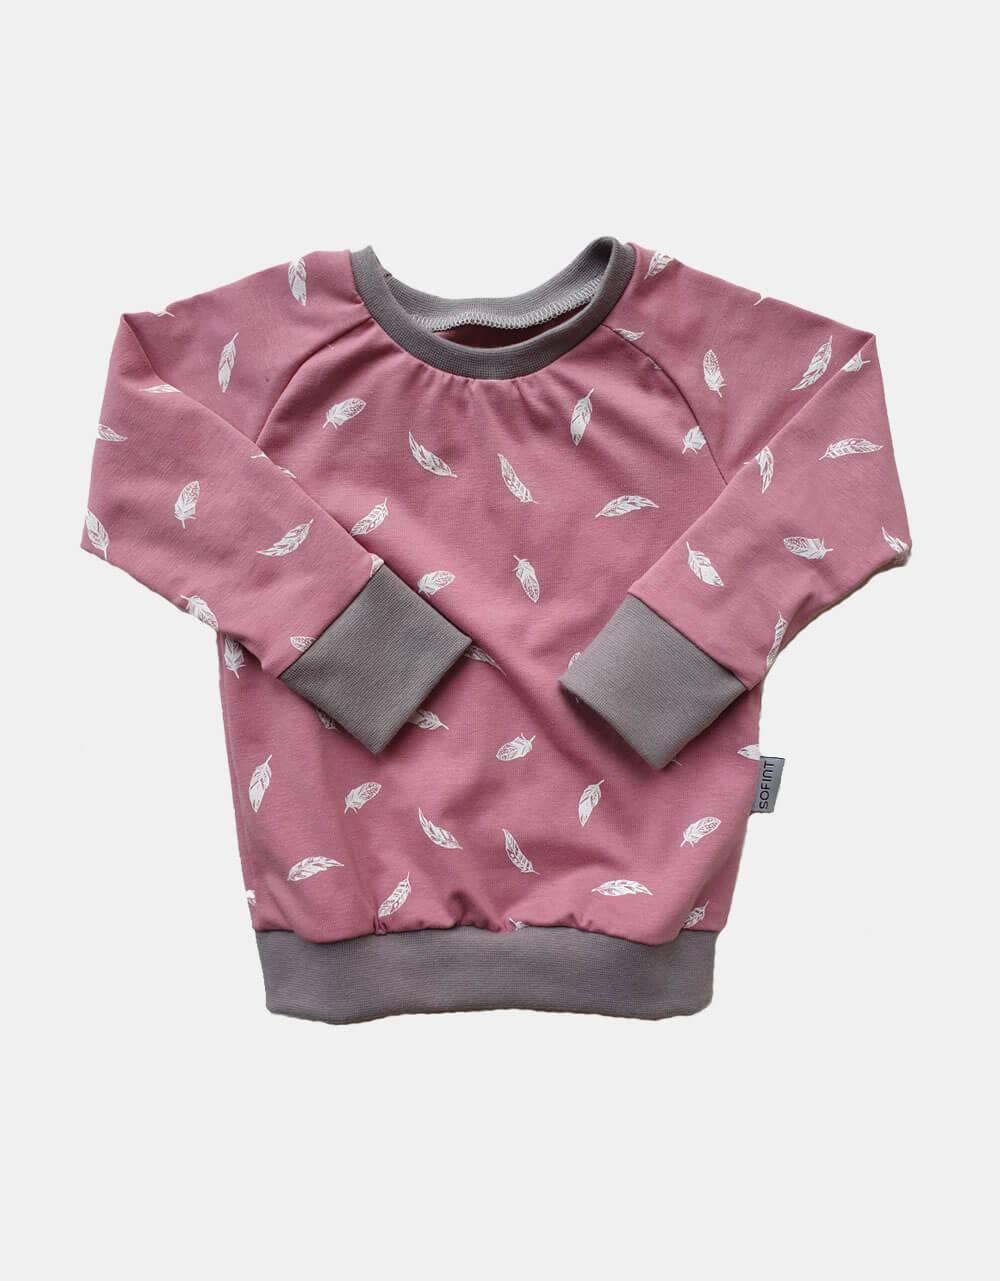 Langarm-Shirt altrosa mit Feder